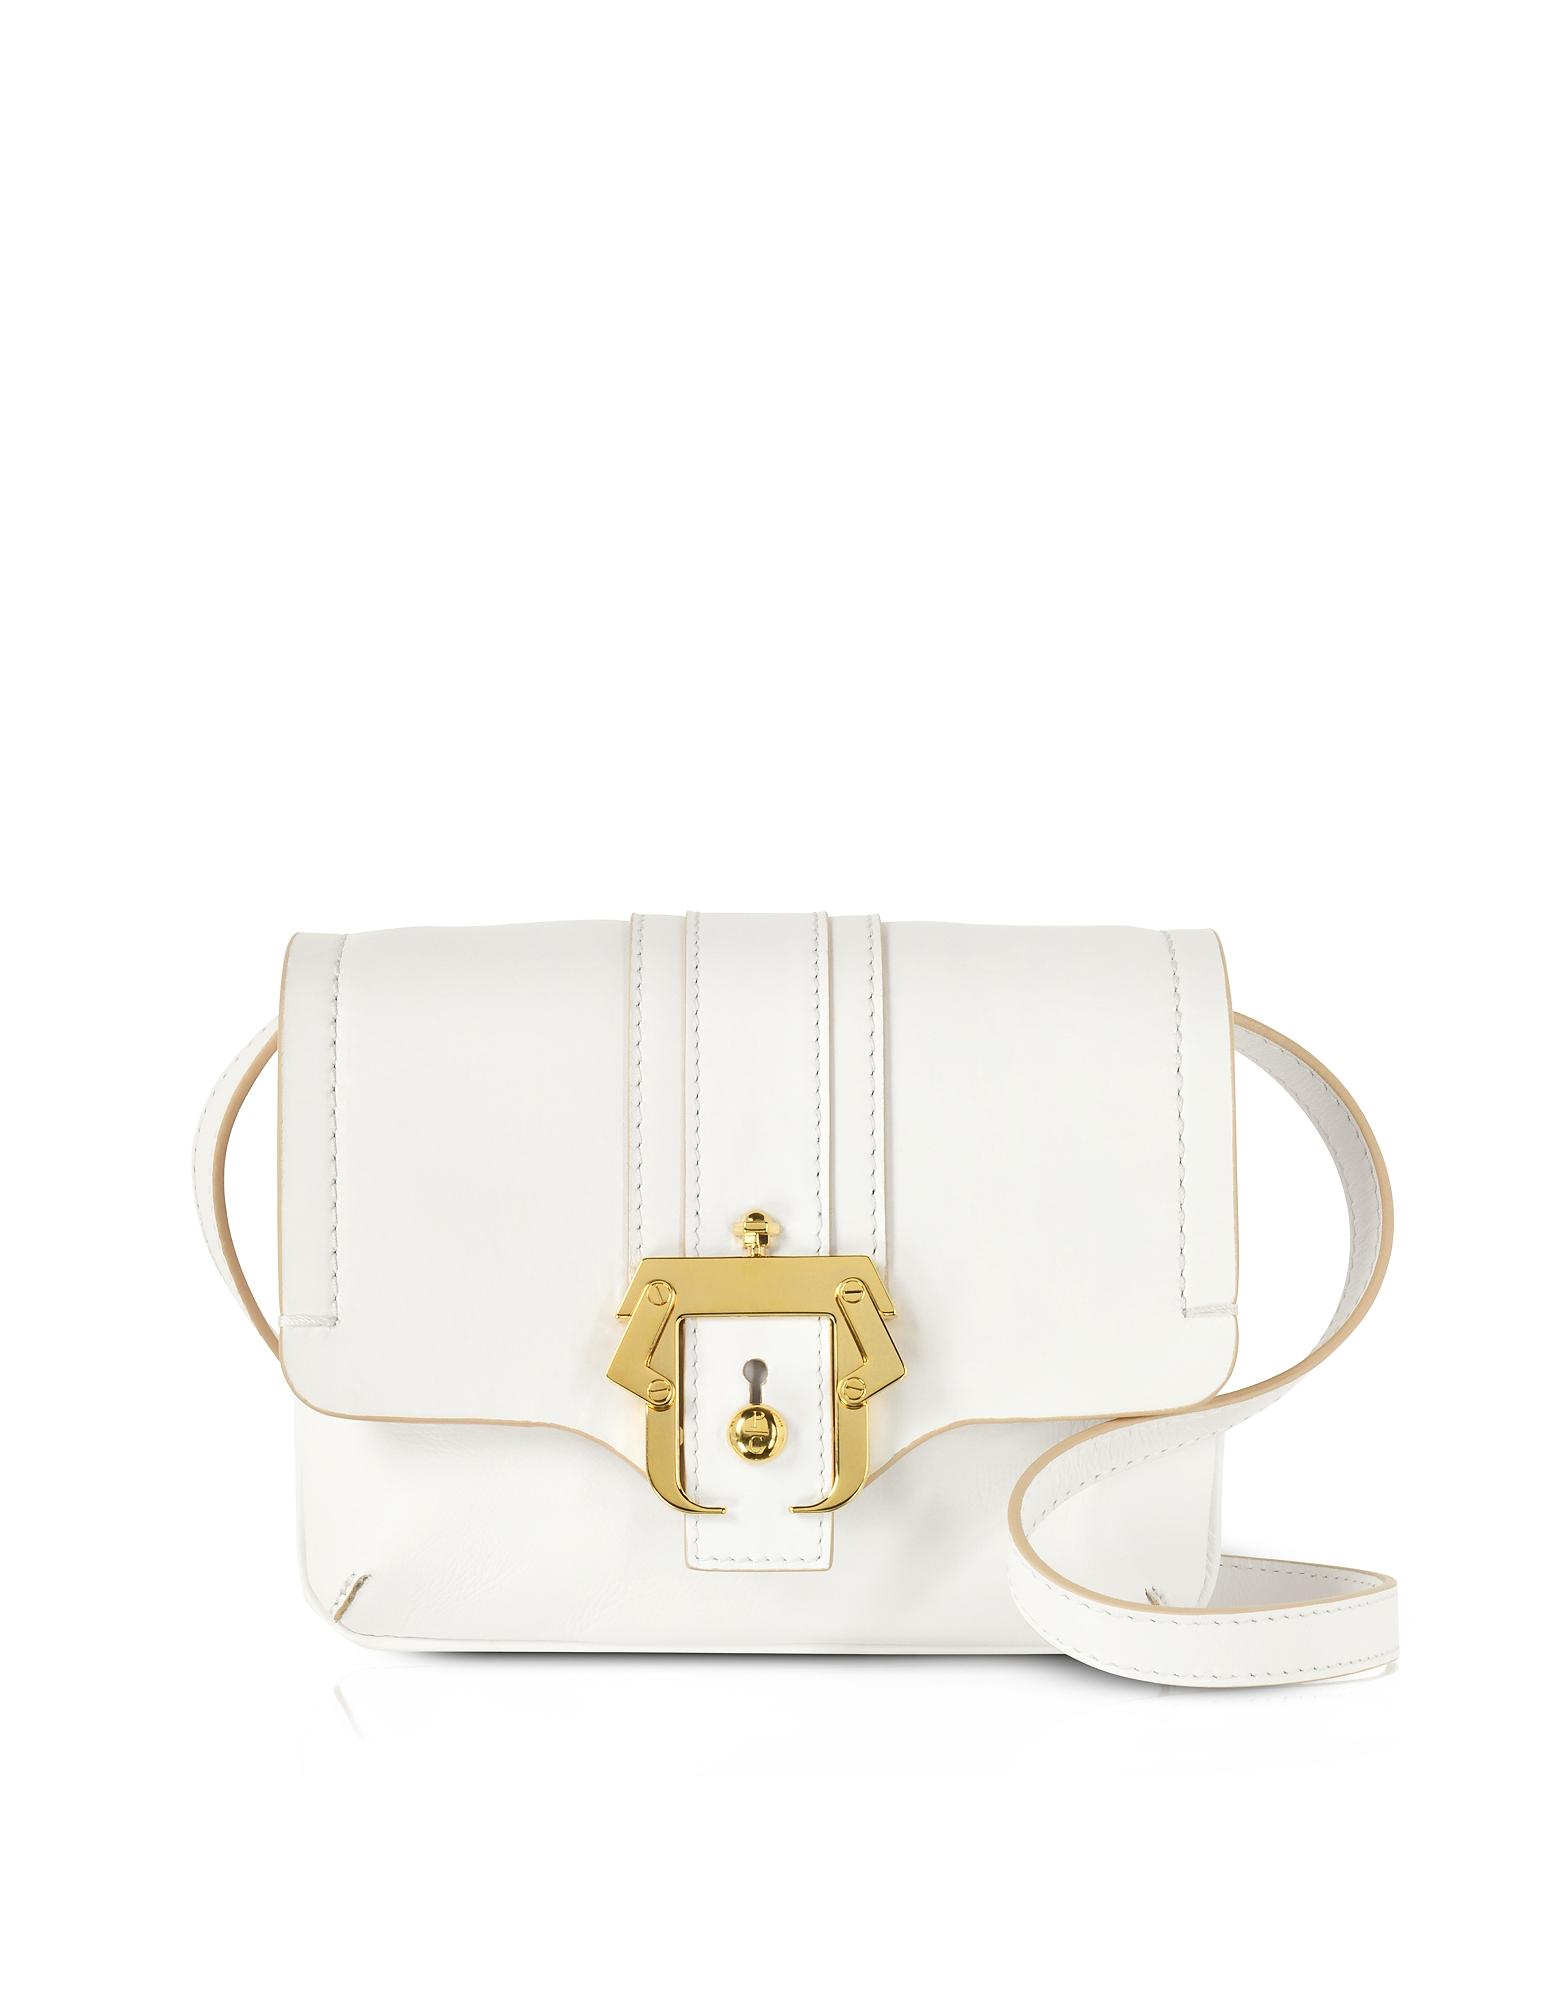 Paula Cademartori Handbags, Cloud Dancer Leather Gigi Crossbody Bag